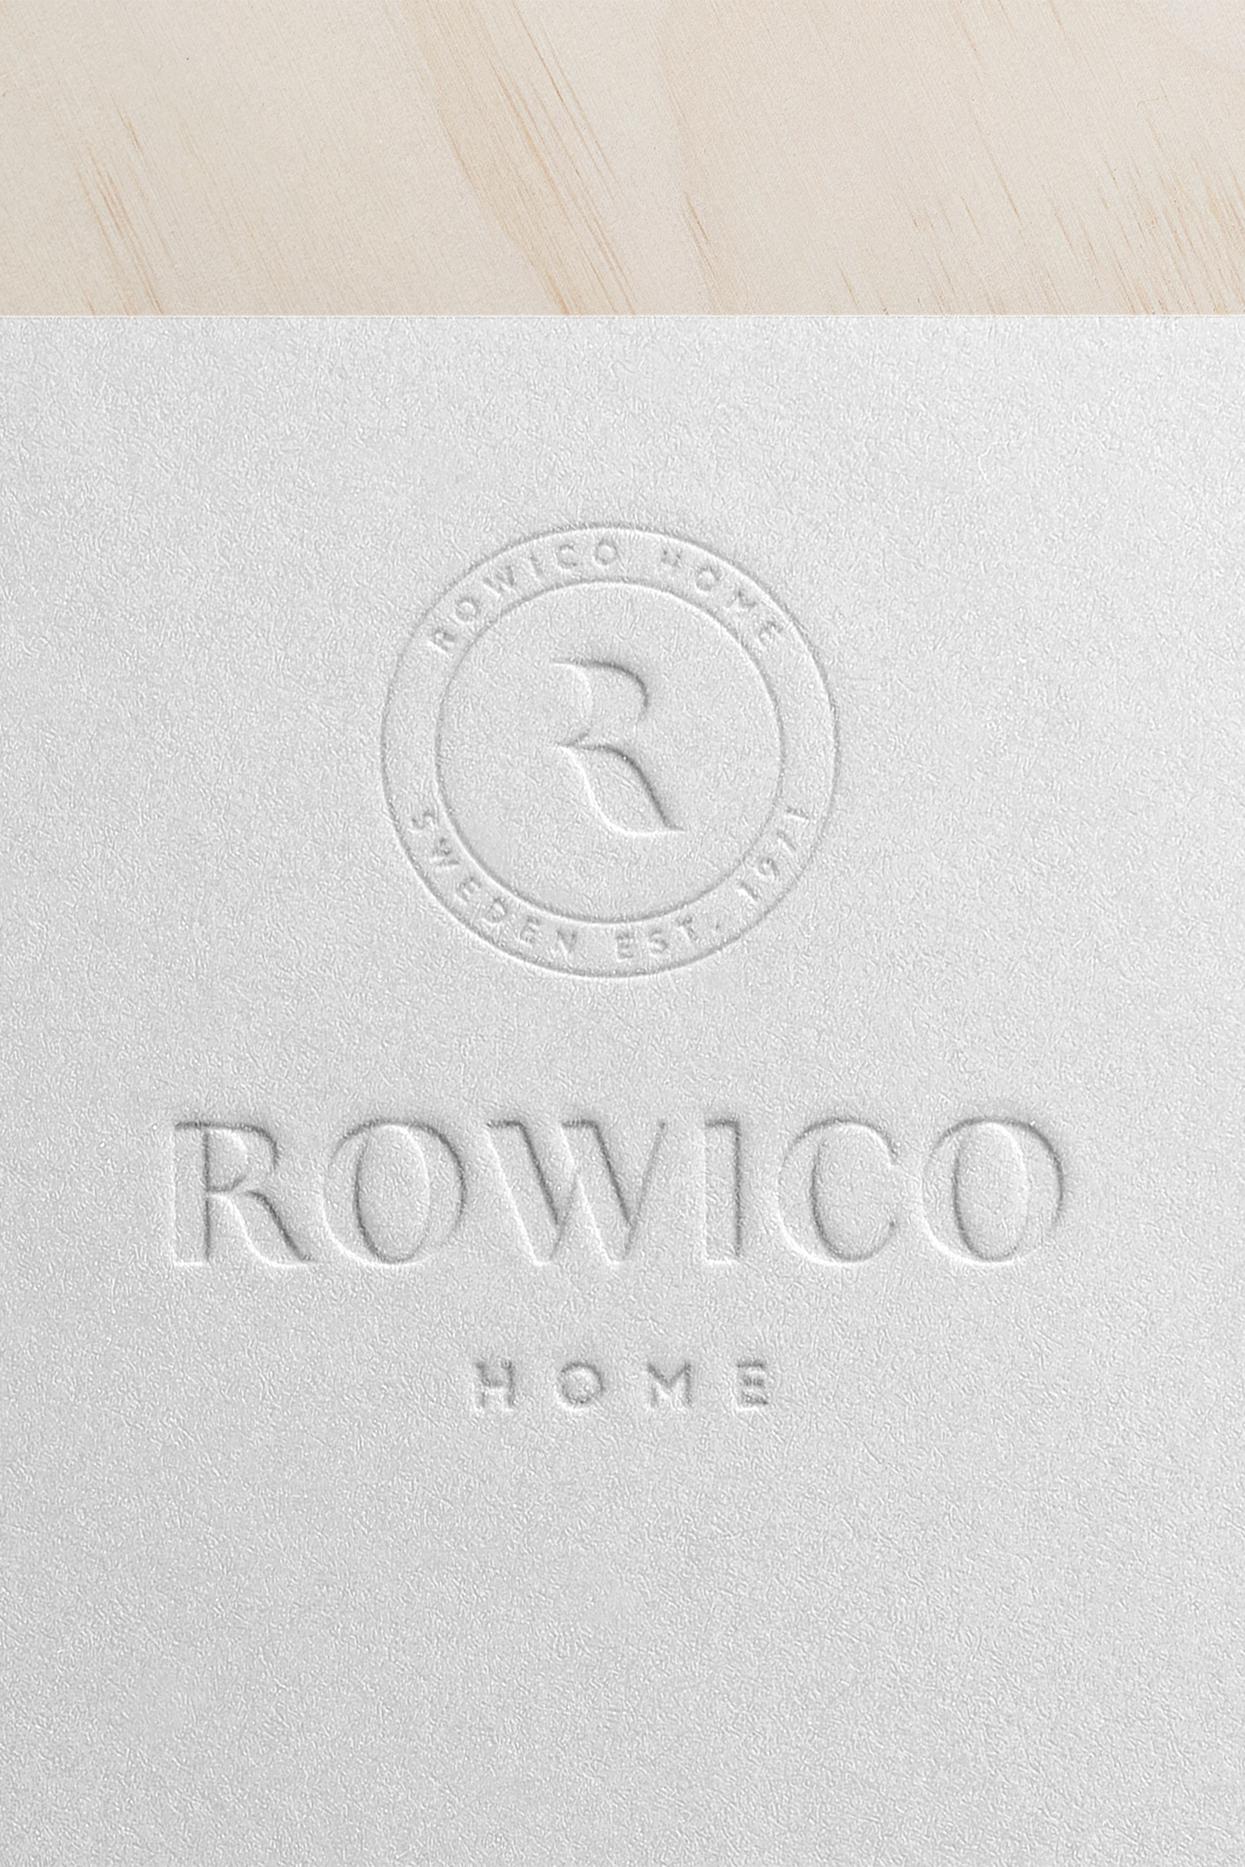 Rowico_logo_debossed_big_2x3